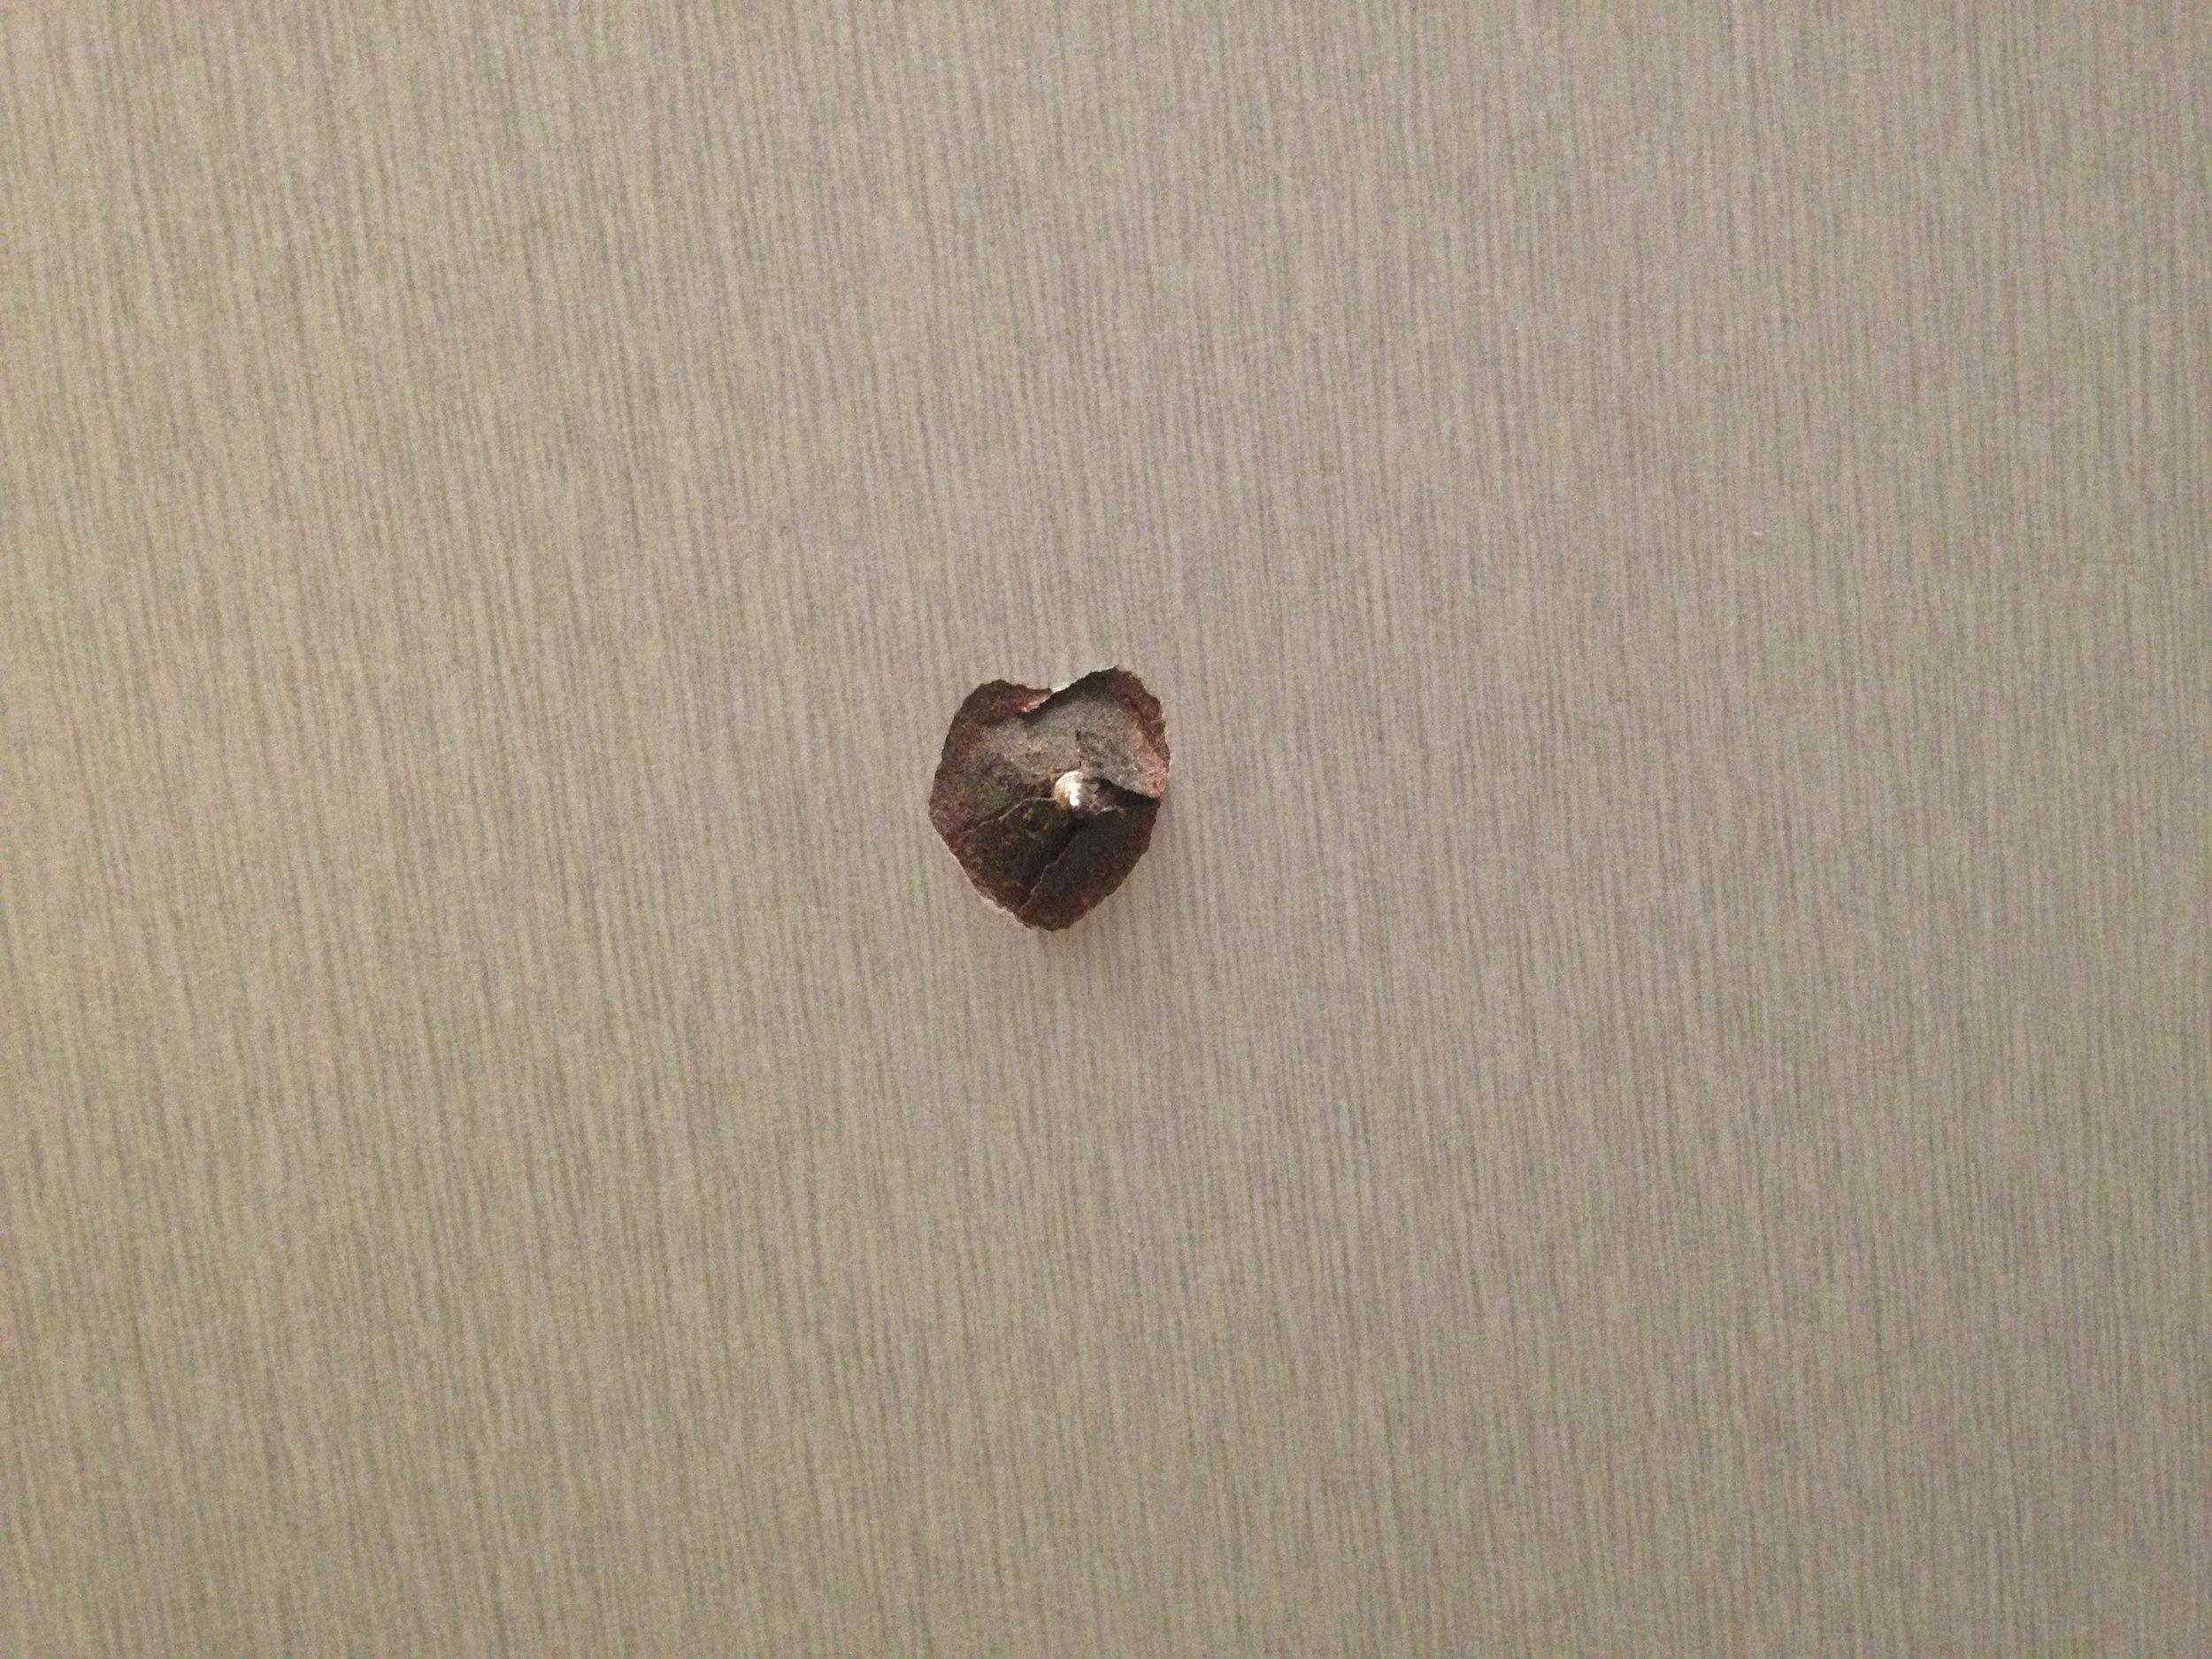 Heart shaped world new zealand .JPG